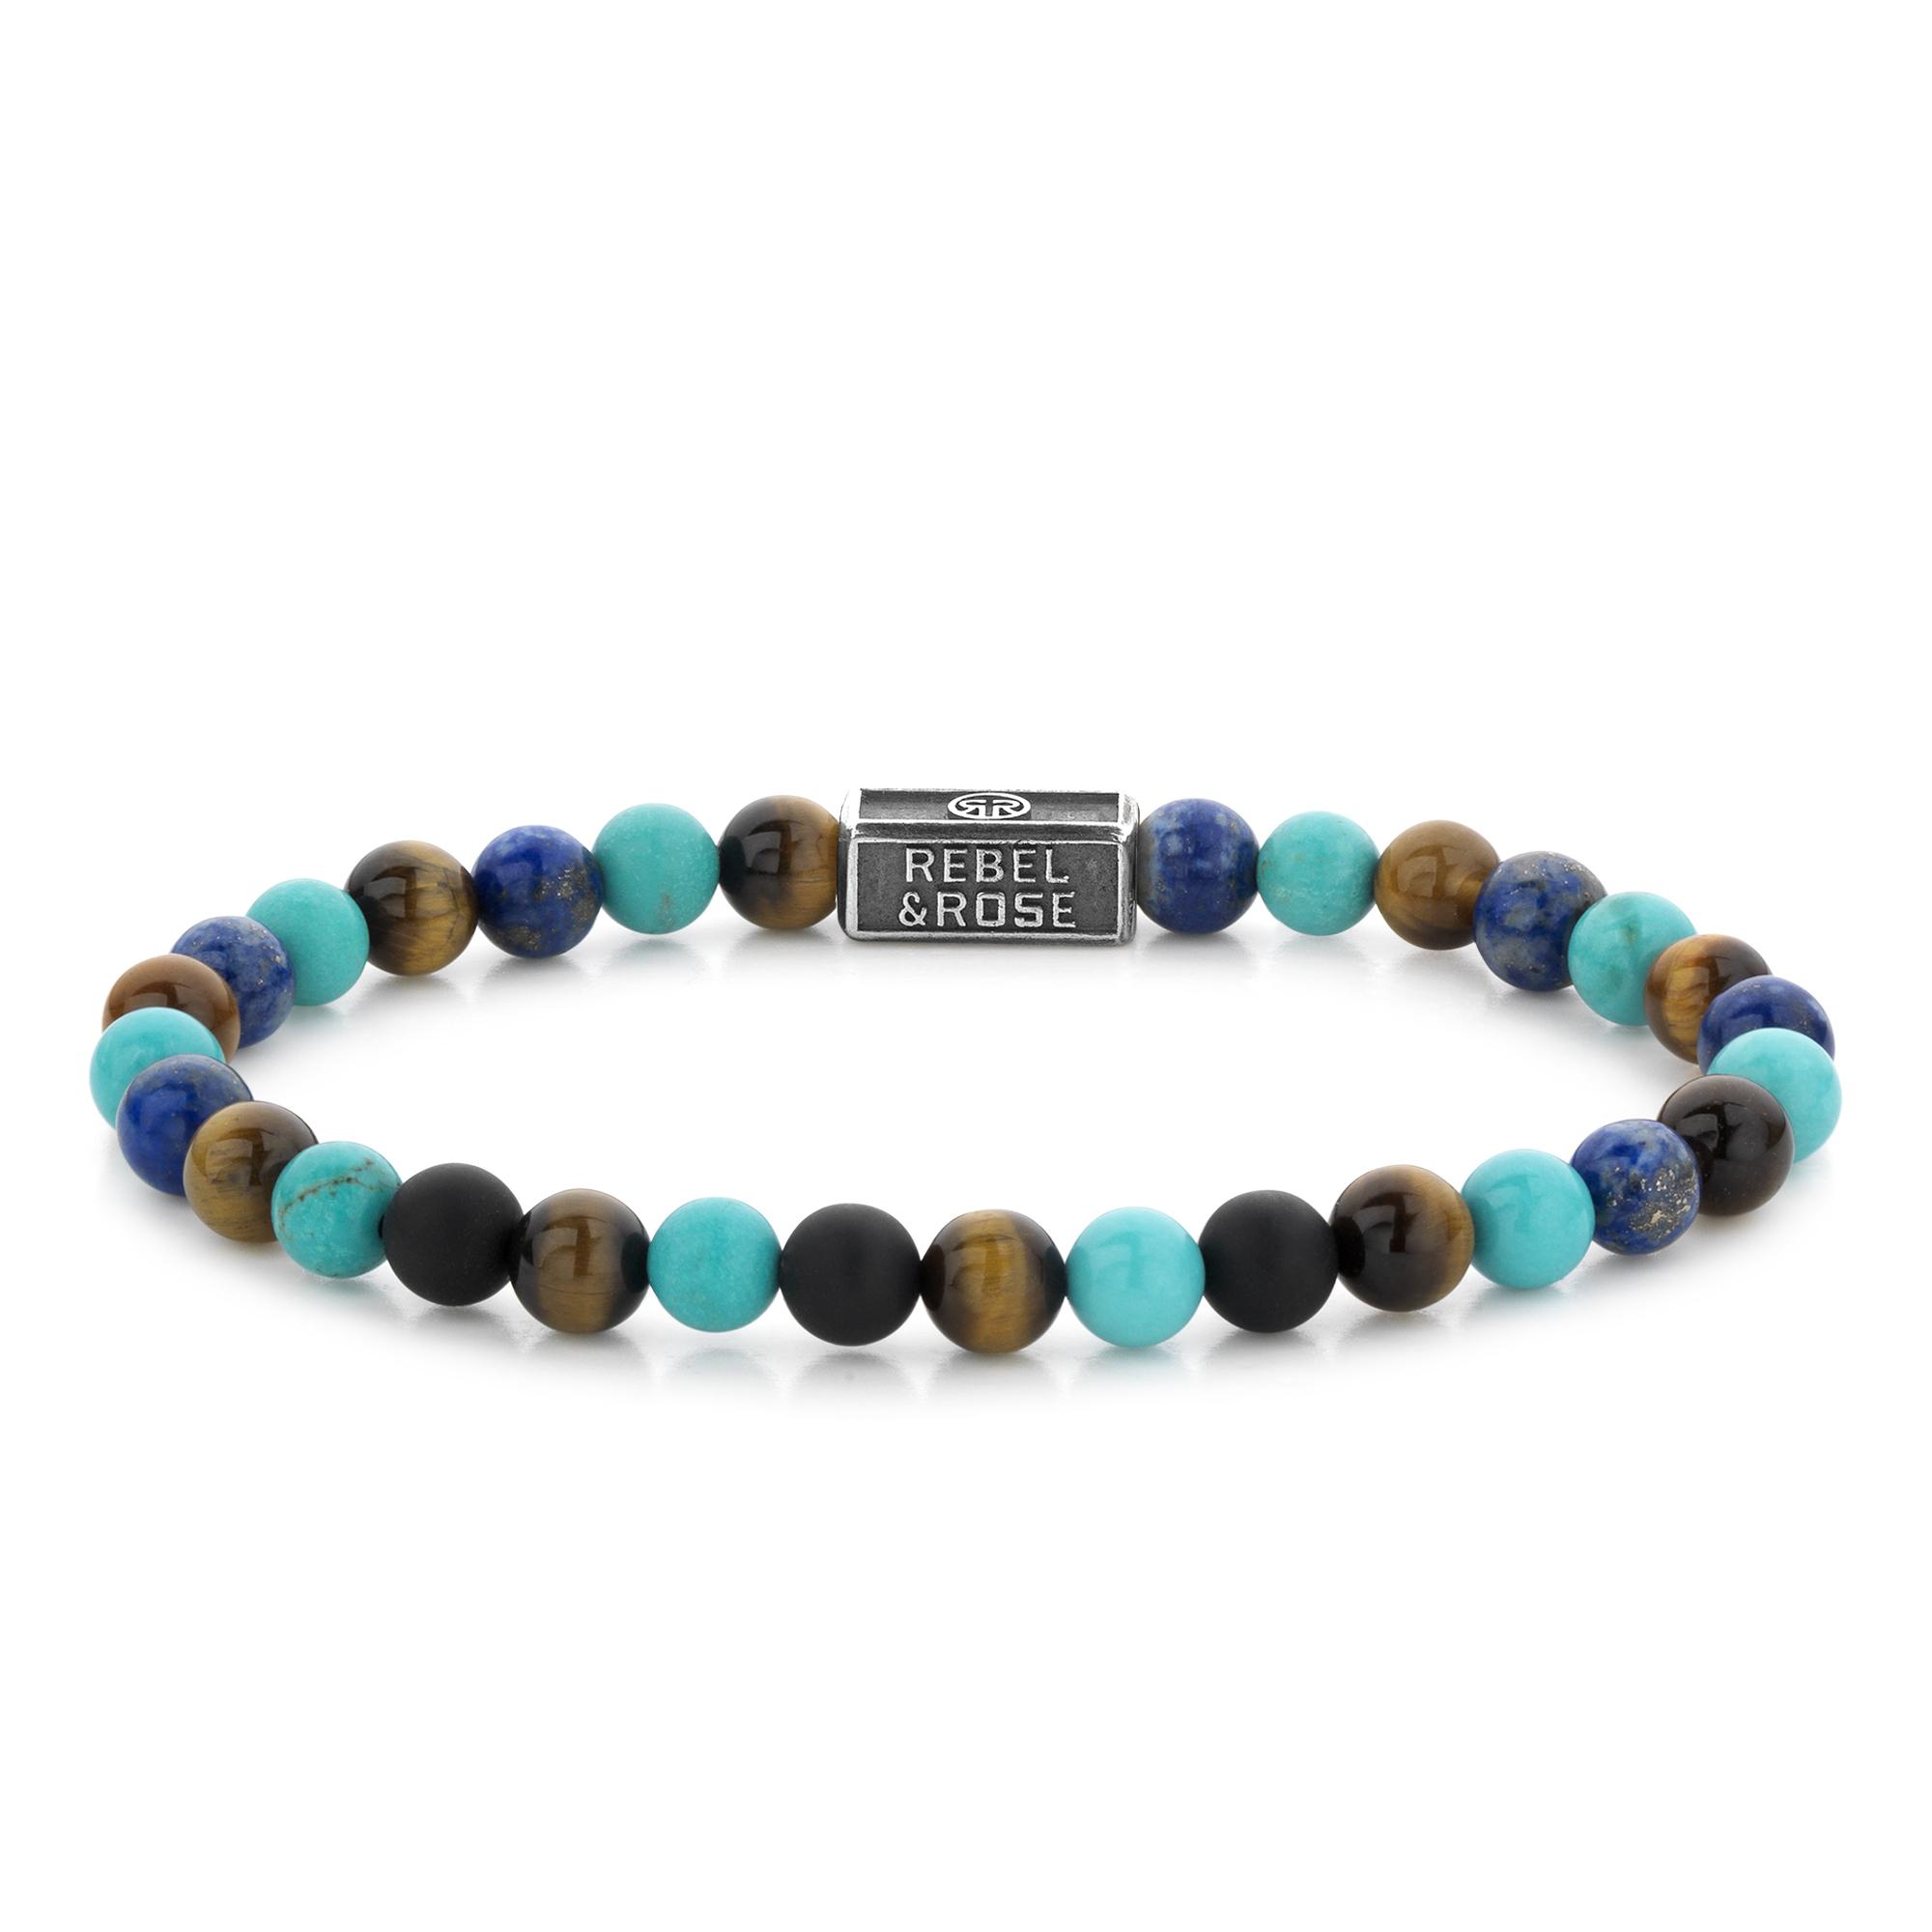 Rebel and Rose RR 6S006 S Rekarmband Beads Mix Turquoise 925 zilver 6 mm meerkleurig S 16,5 cm